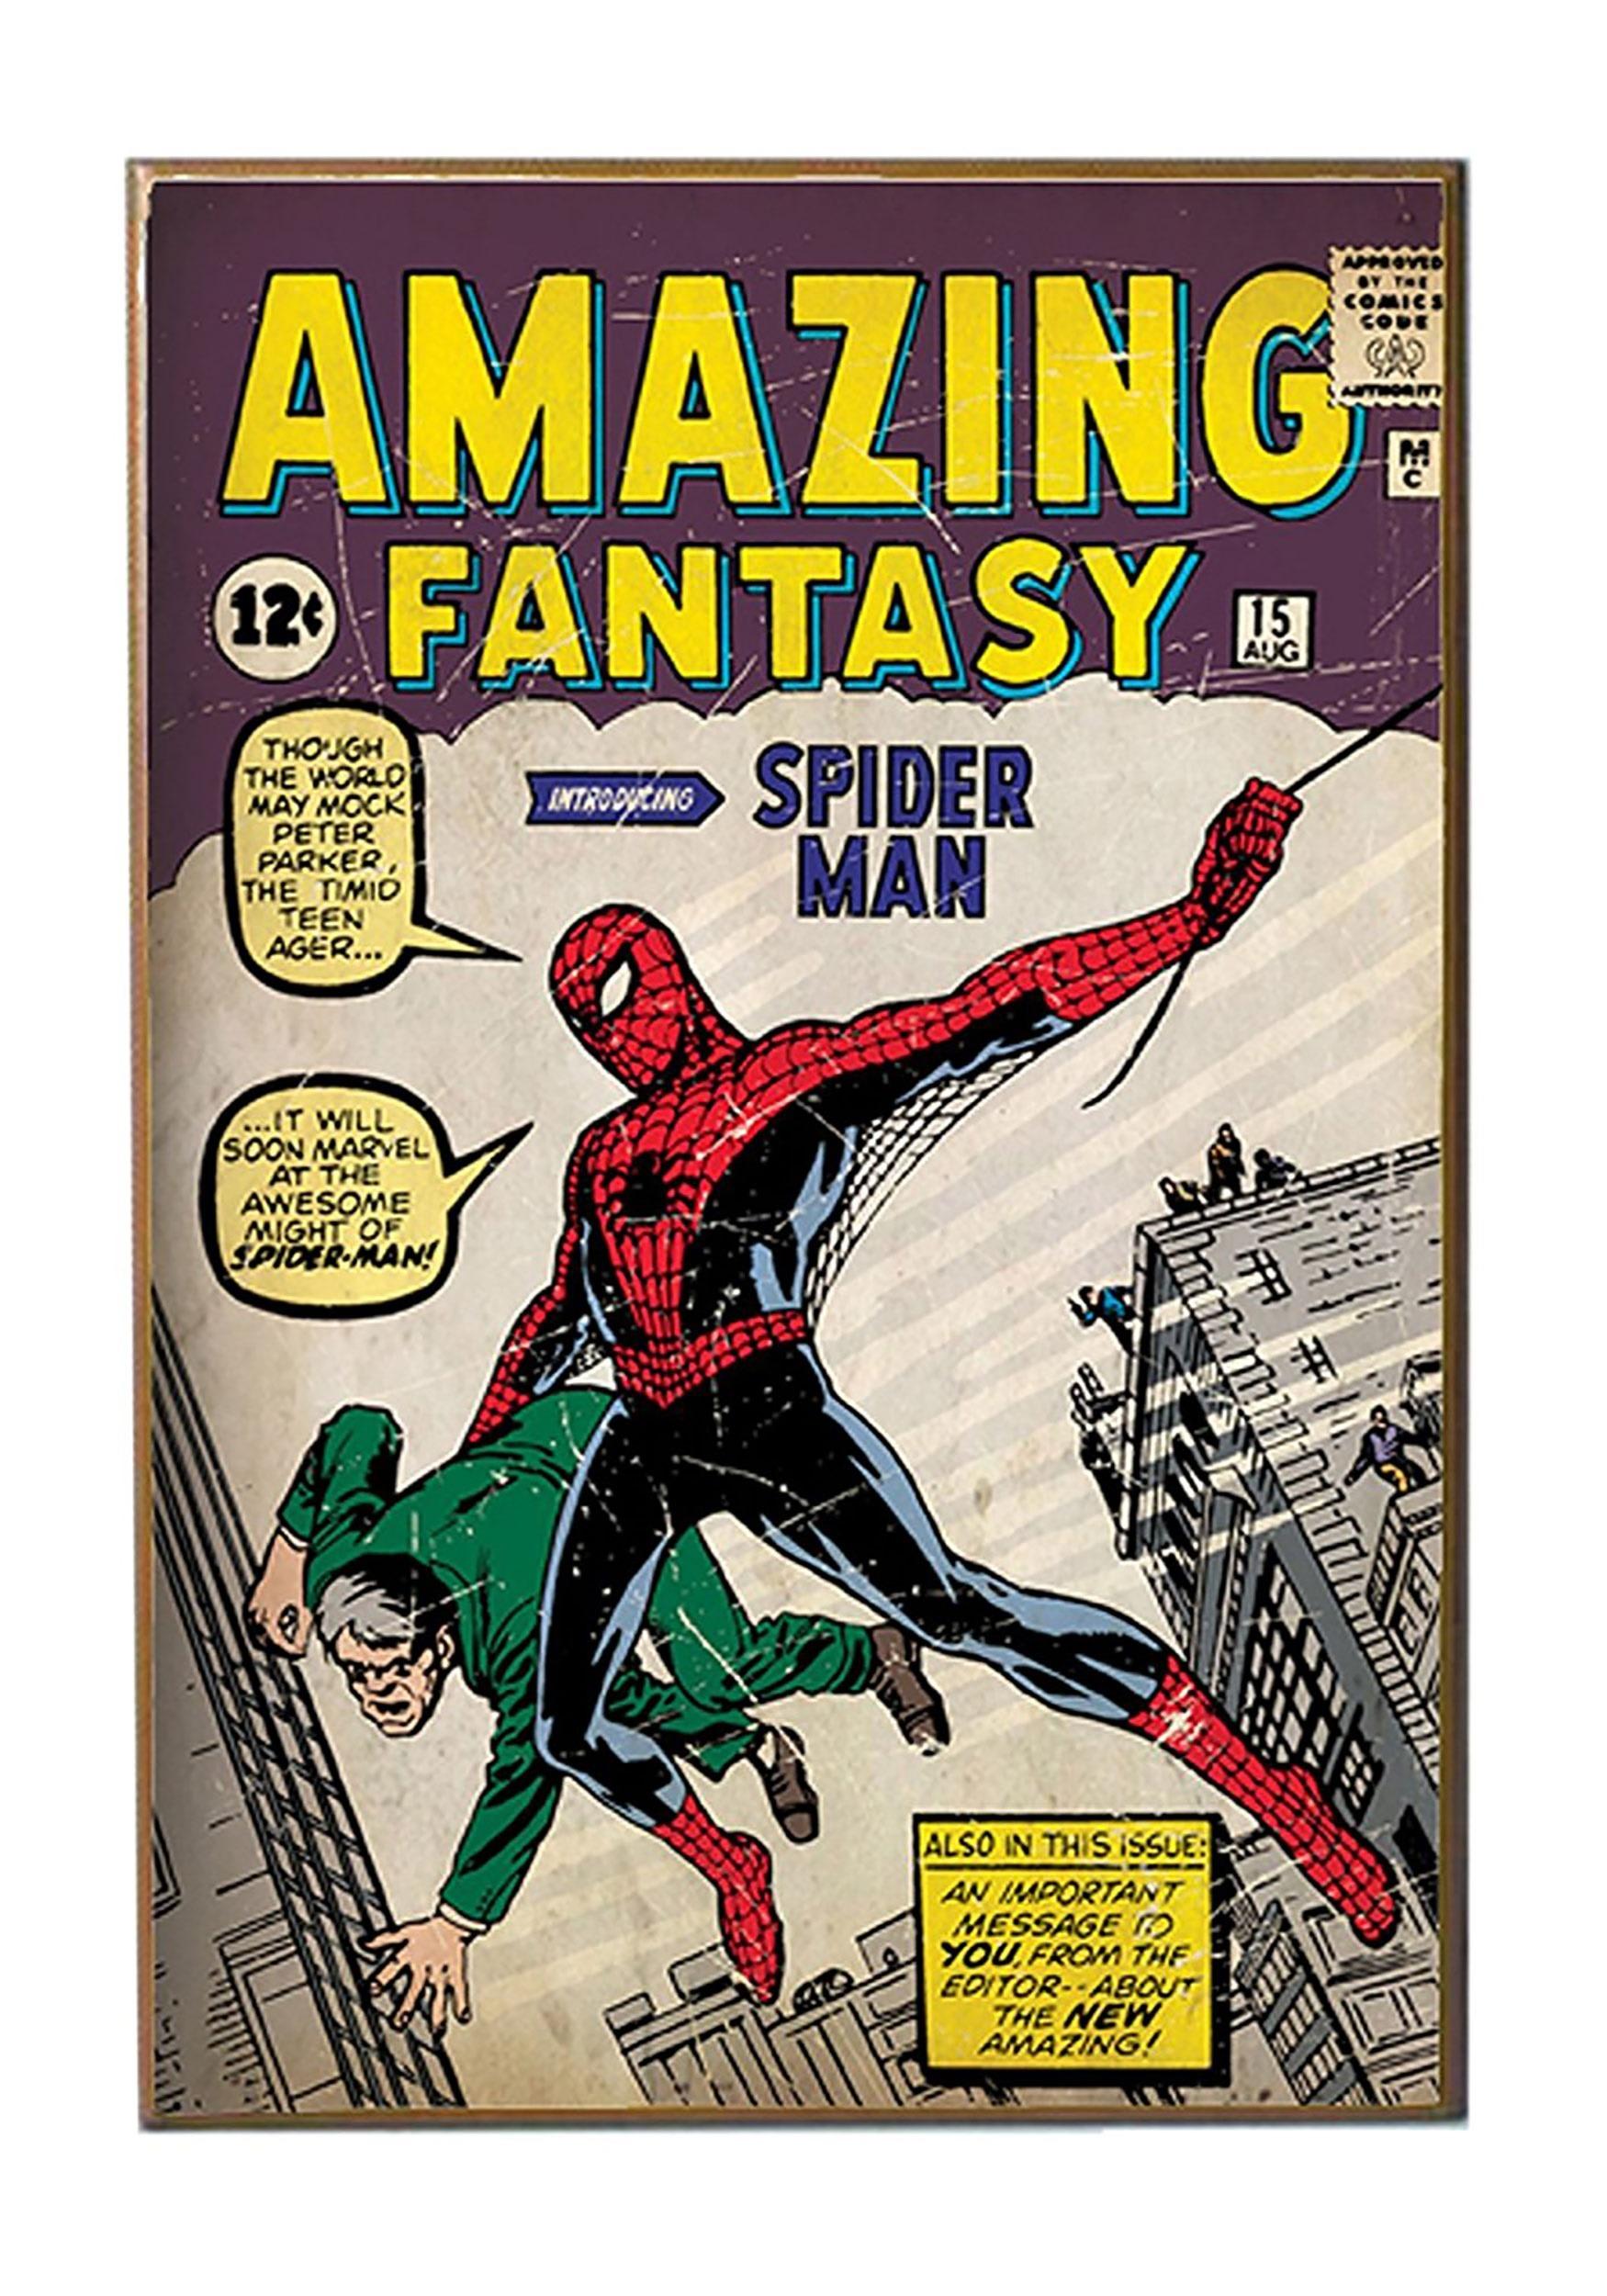 "Spiderman Amazing Fantasy 13"" x 19"" Wood Wall Décor SBMC8536"